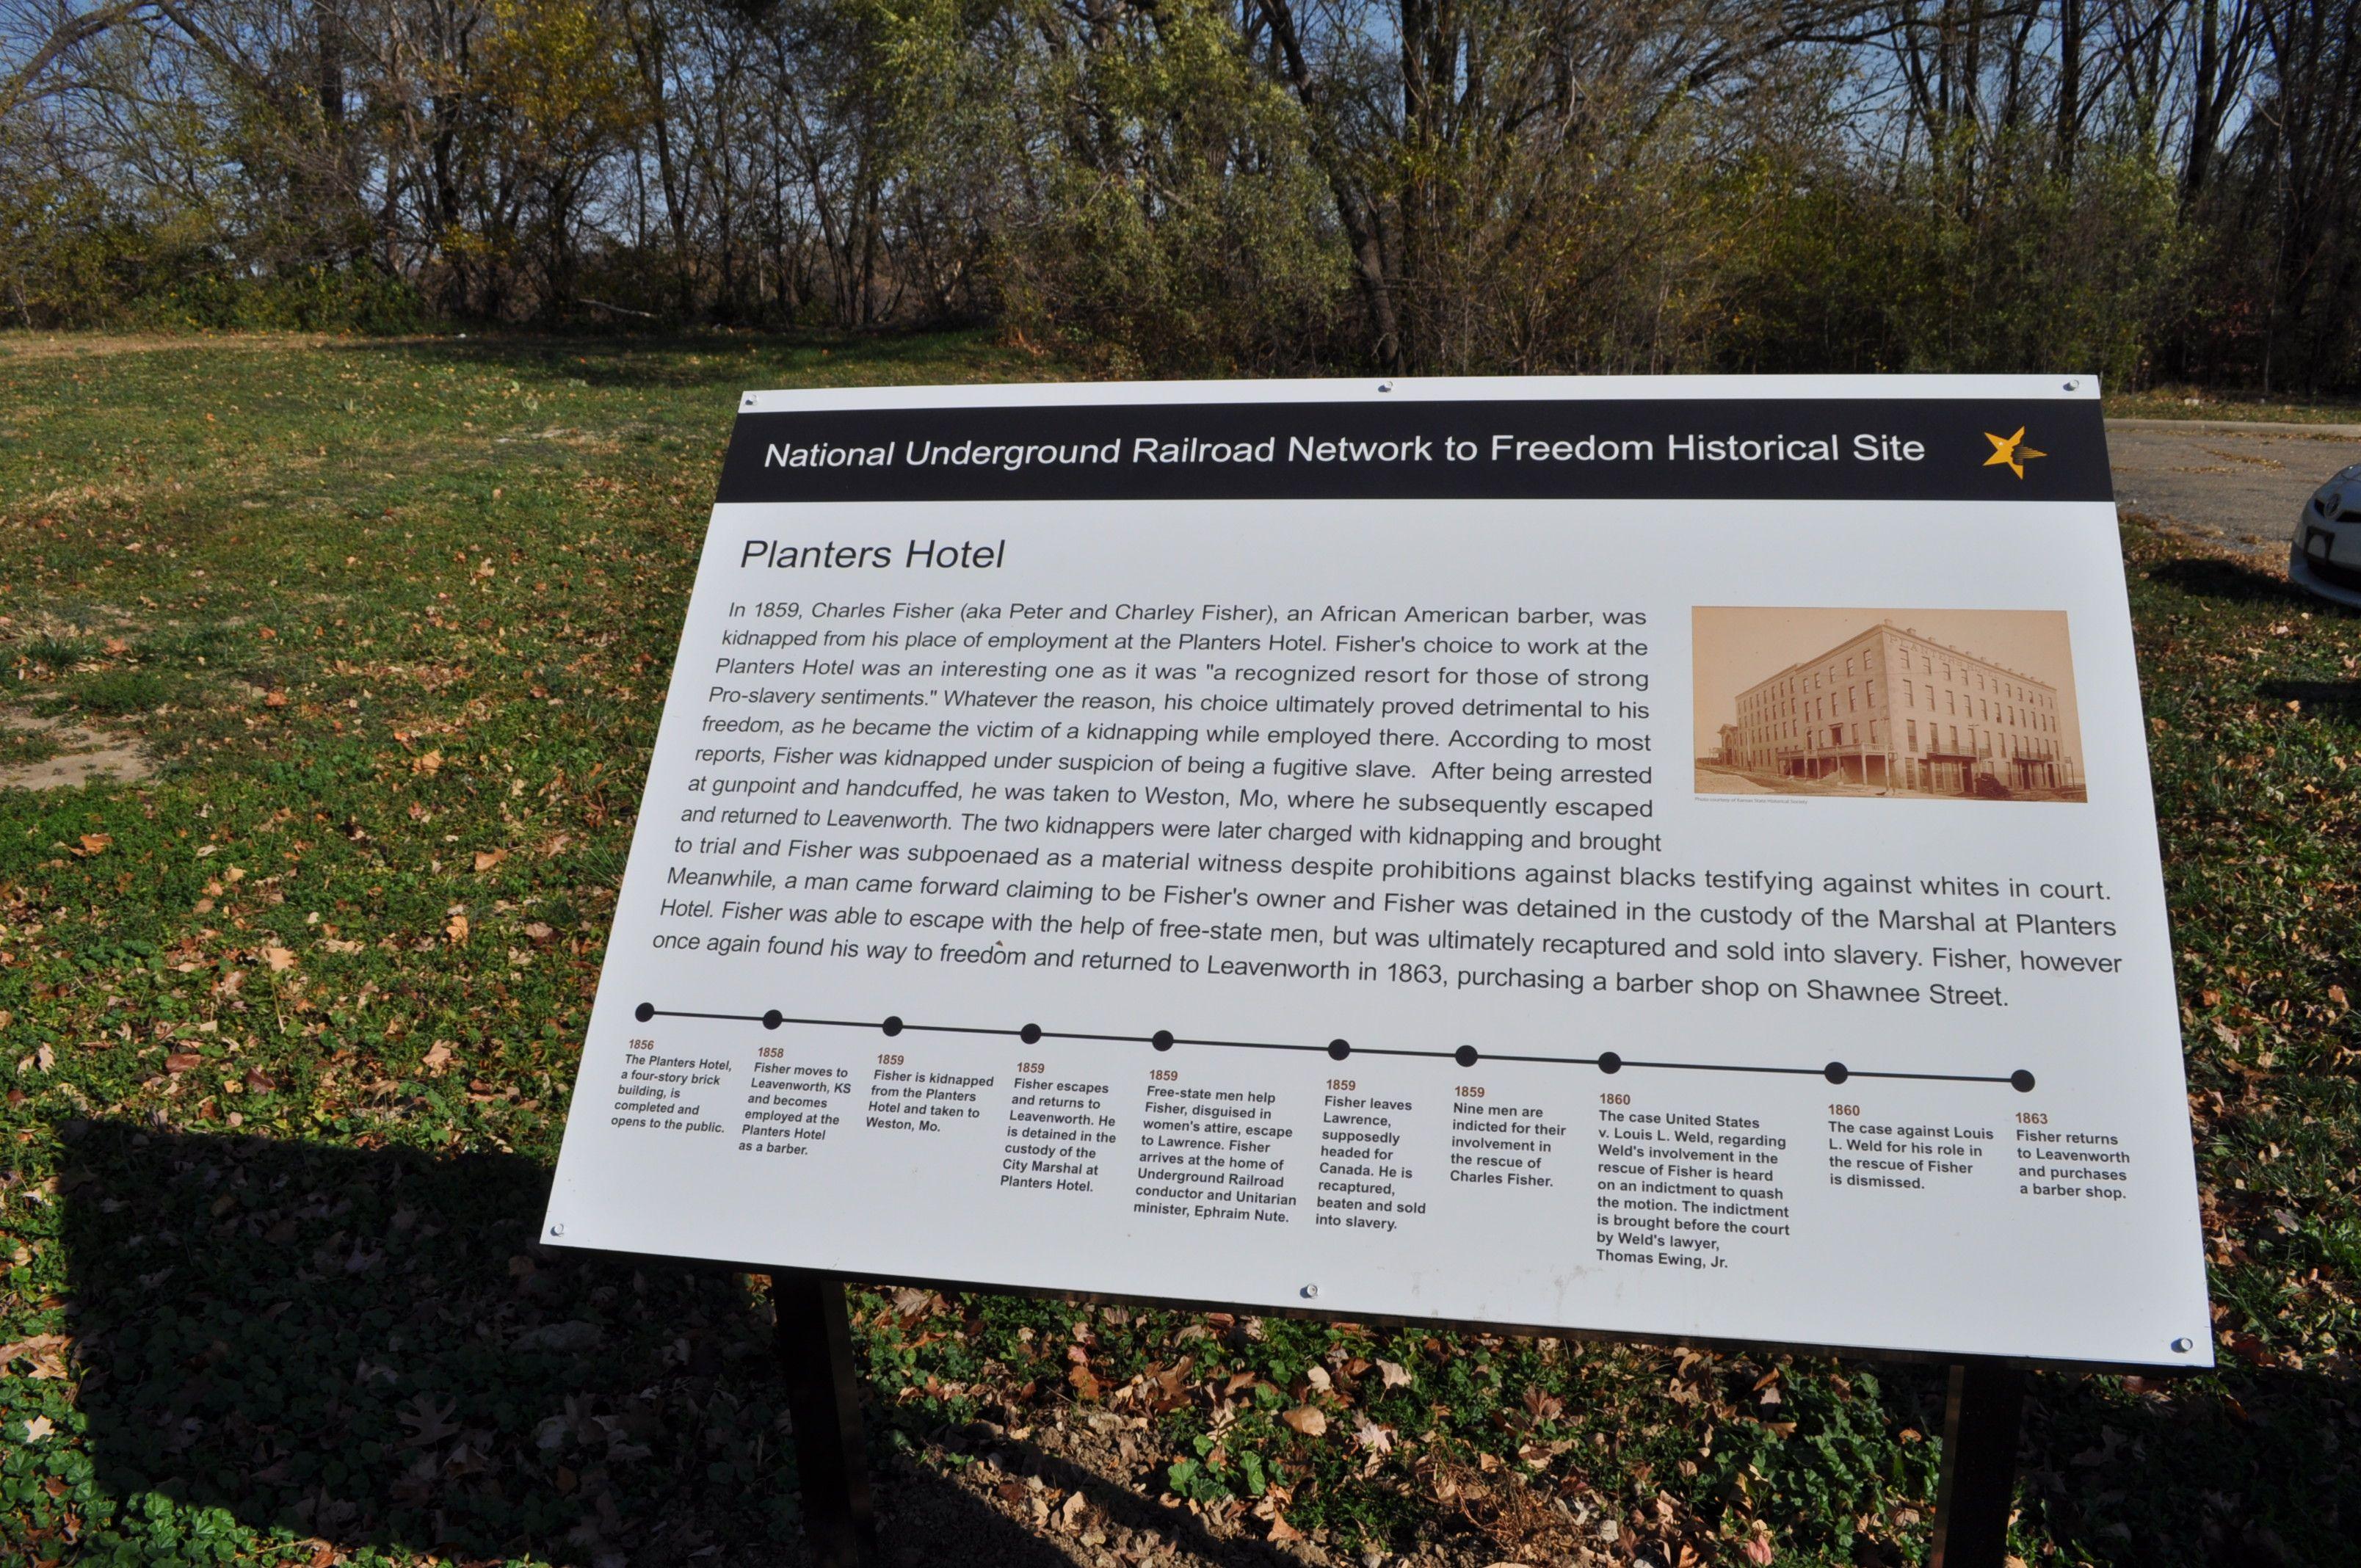 Marker For Underground Railroad Site Planters Hotel In Leavenworth Kansas Along Esplanade Street